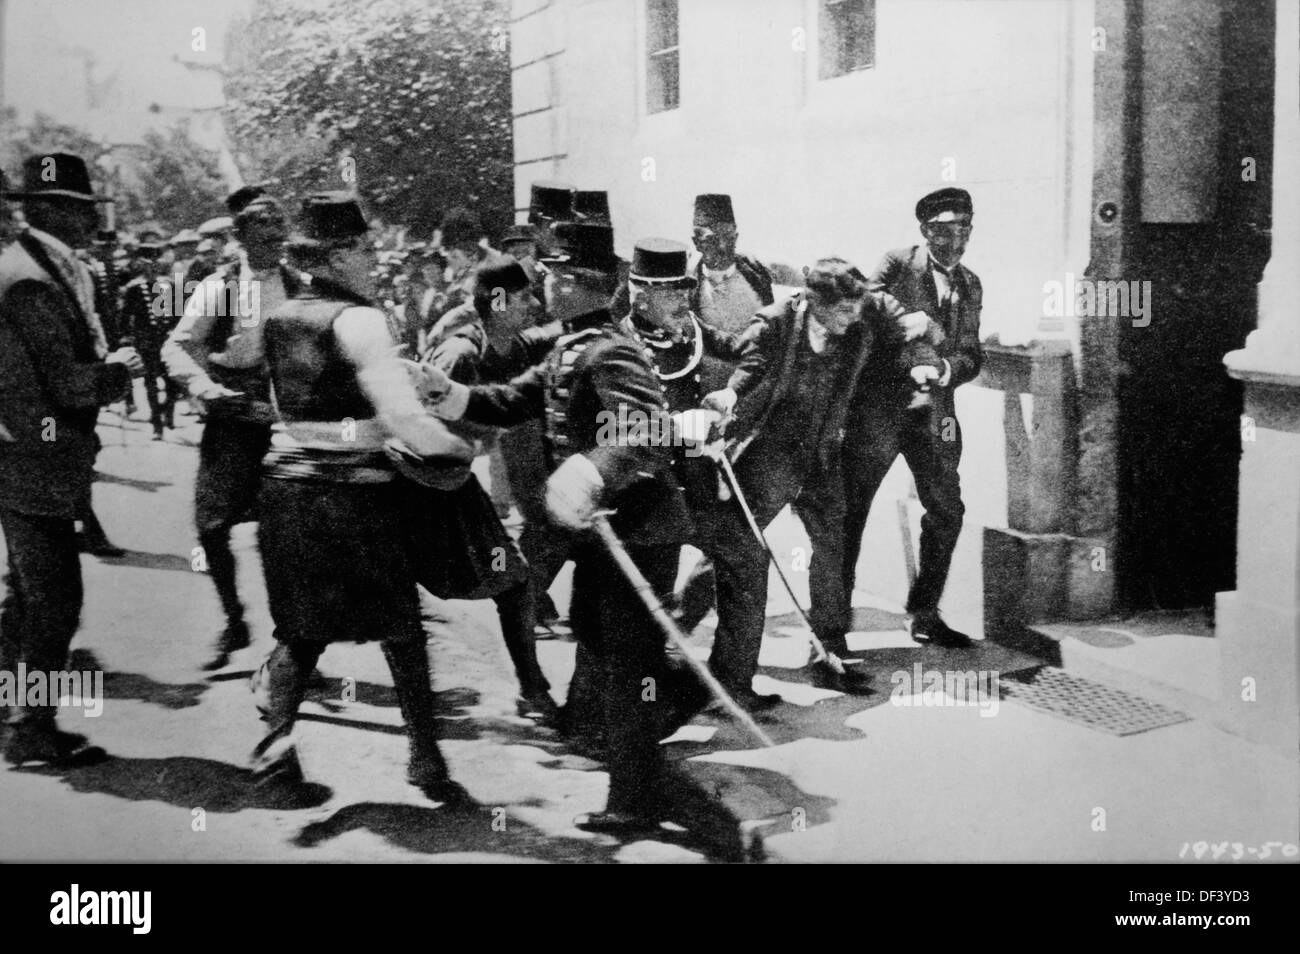 Arrest of First Bomb Thrower, Nedeljko Cabrinovic, in Assassination of Archduke Franz Ferdinand and Wife, Sarajevo, - Stock Image